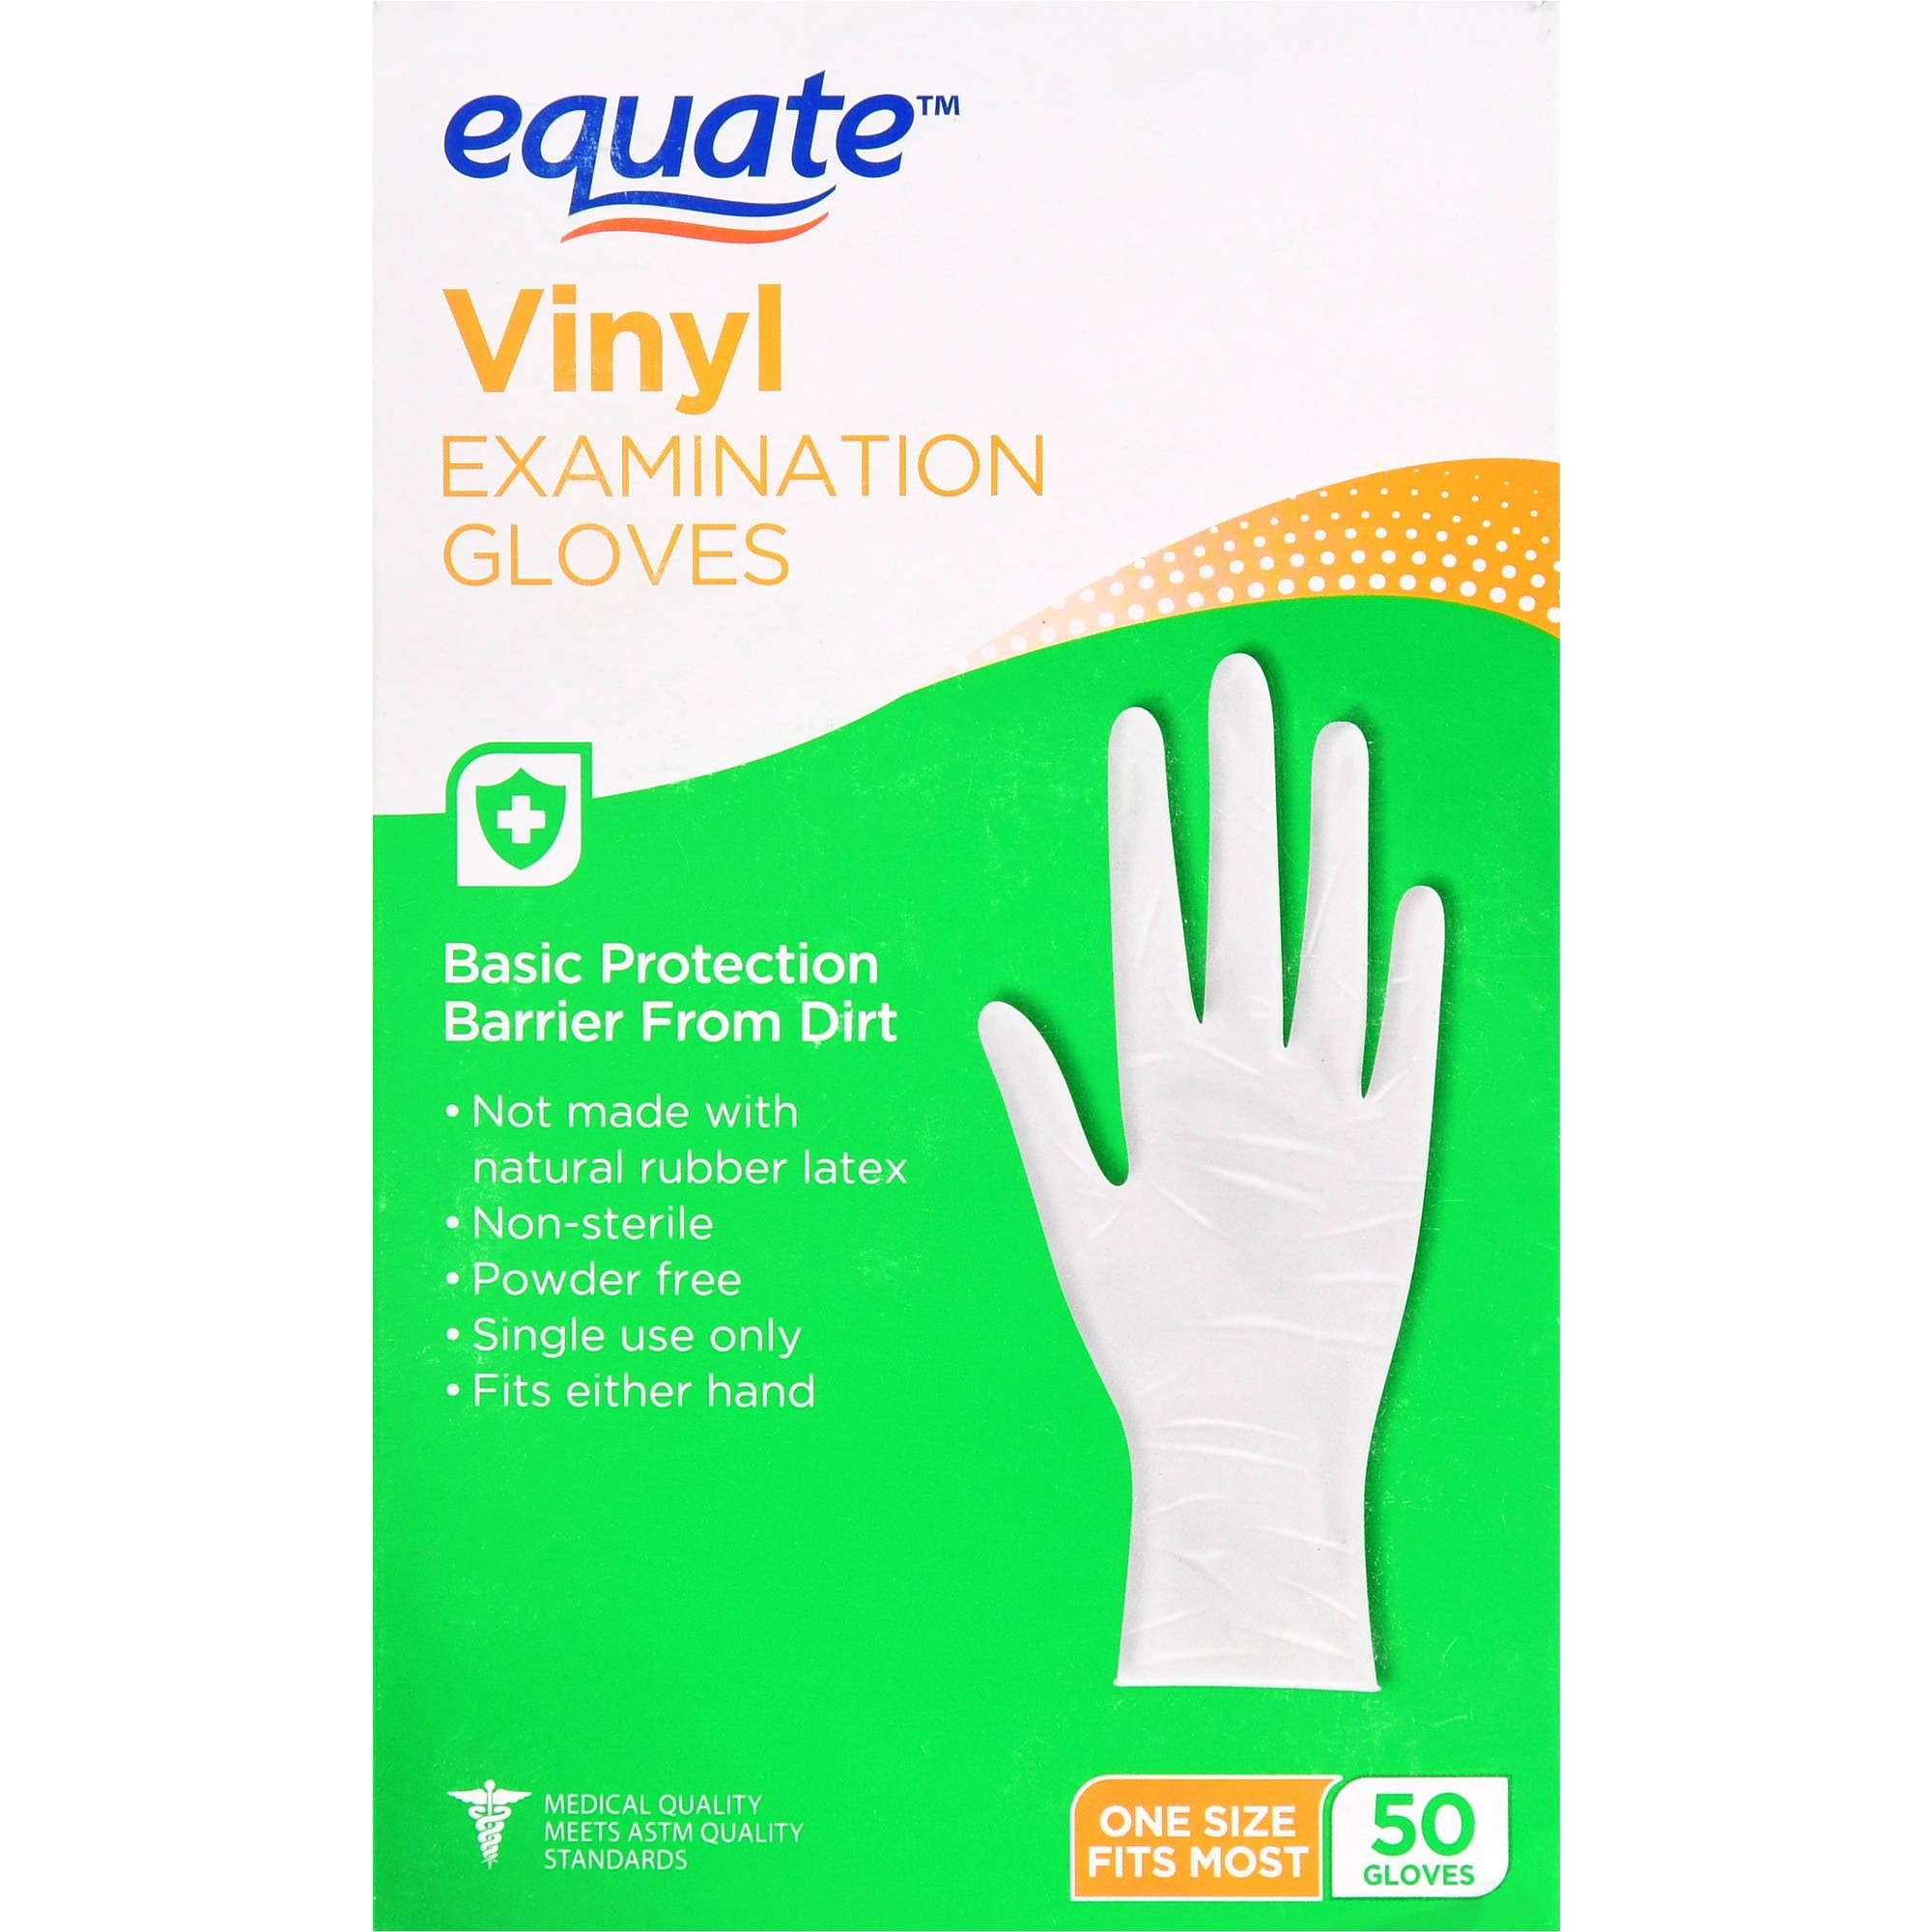 Equate Vinyl Examination Gloves, One Size, 50 Ct